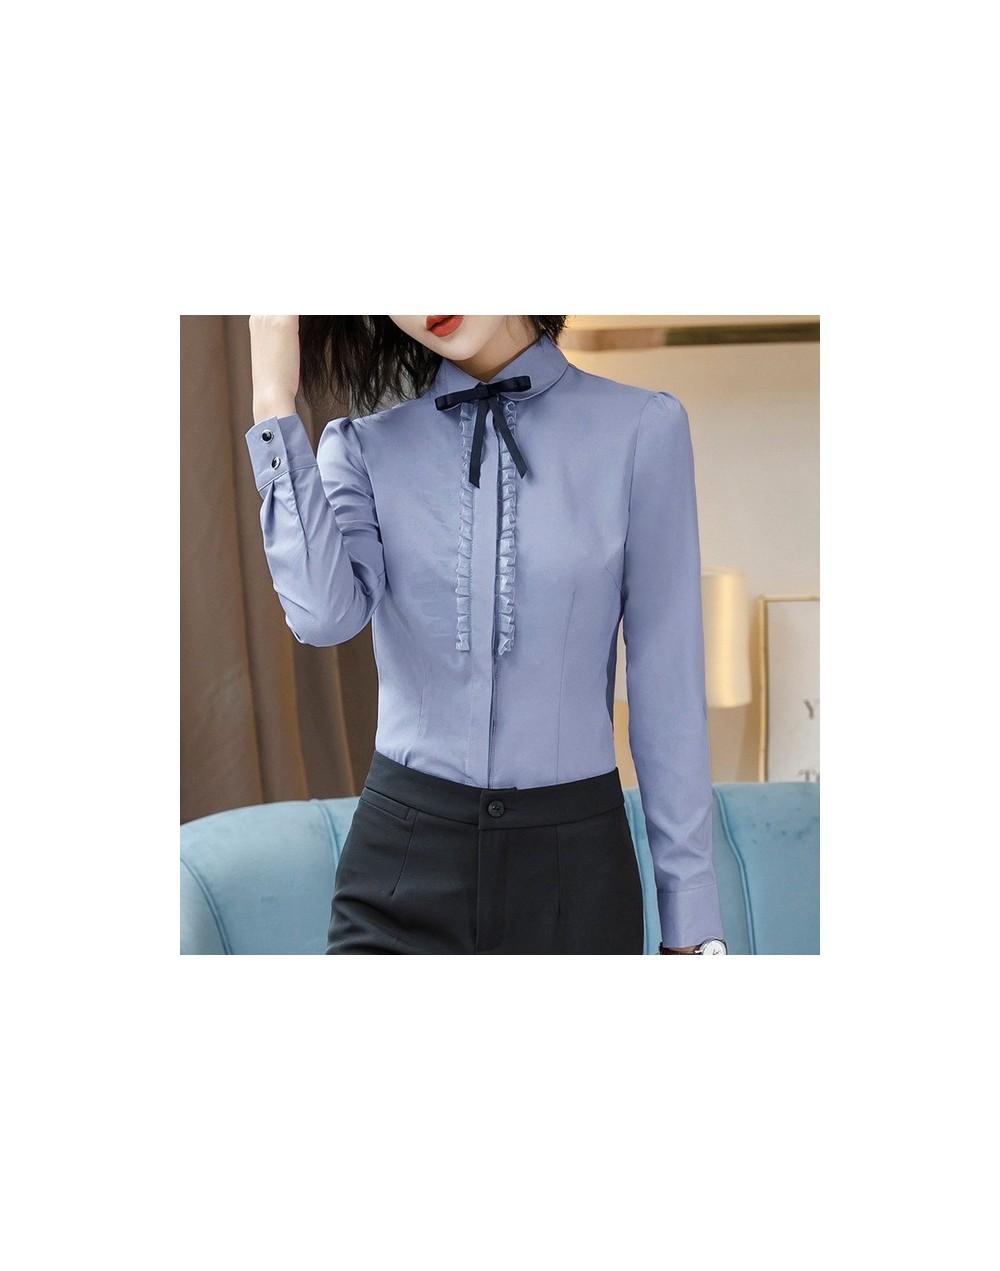 2019 Black Pant Suits Women Business Work Jacket Trousers Fashion Casual Pants Blazer Set Office Lady Female Clothing Plus S...